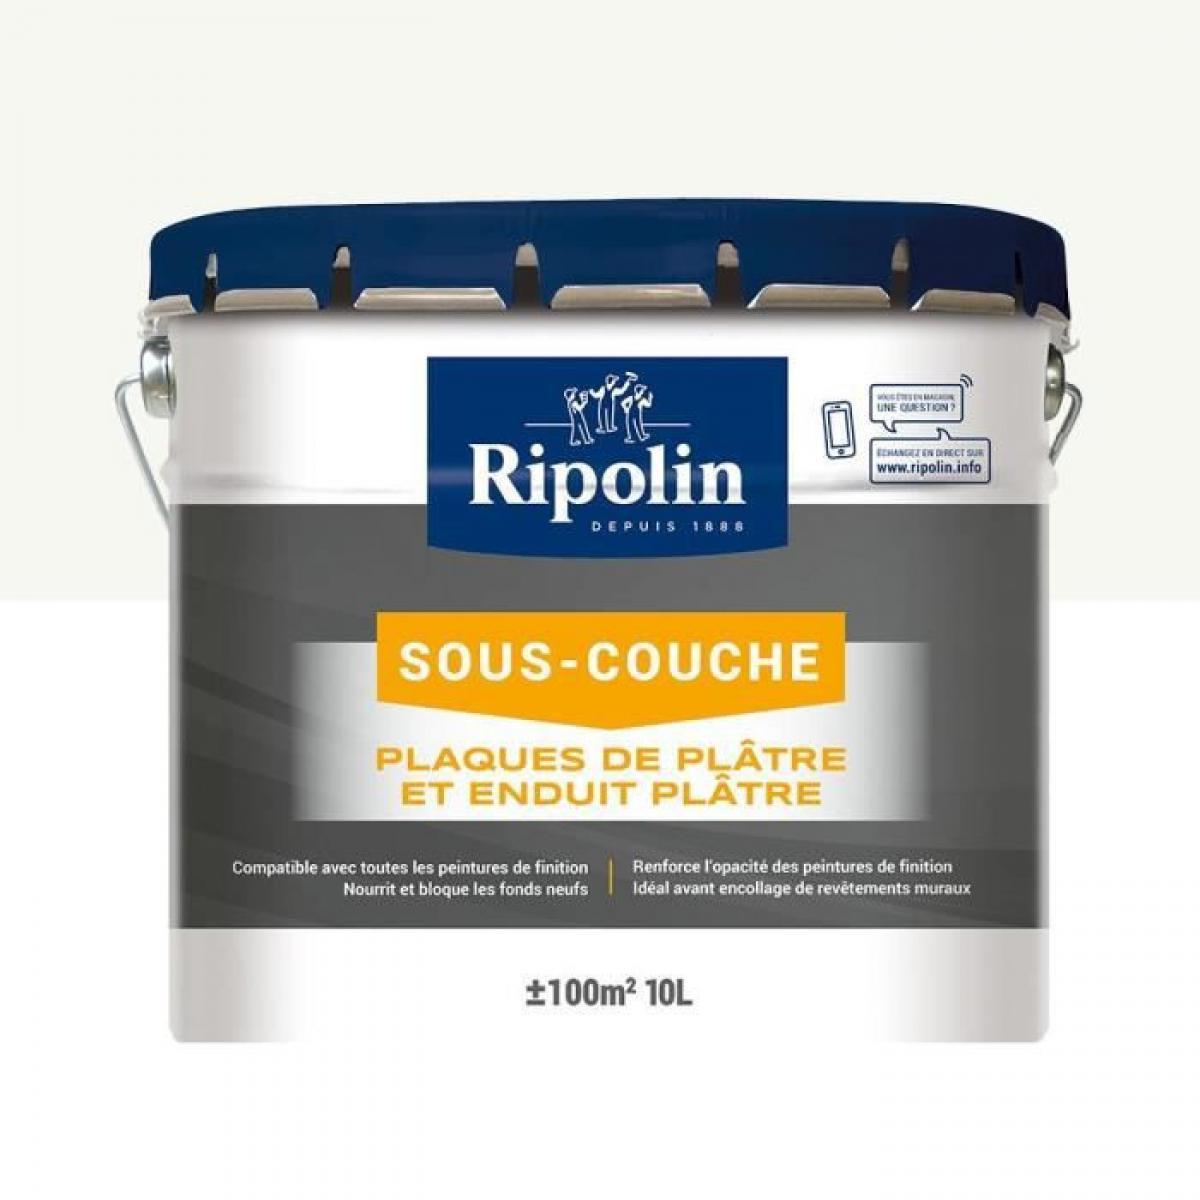 Ripolin RIPOLIN Sous-Couche Plaque de Platre Ripolin - Blanc Mat, 10L